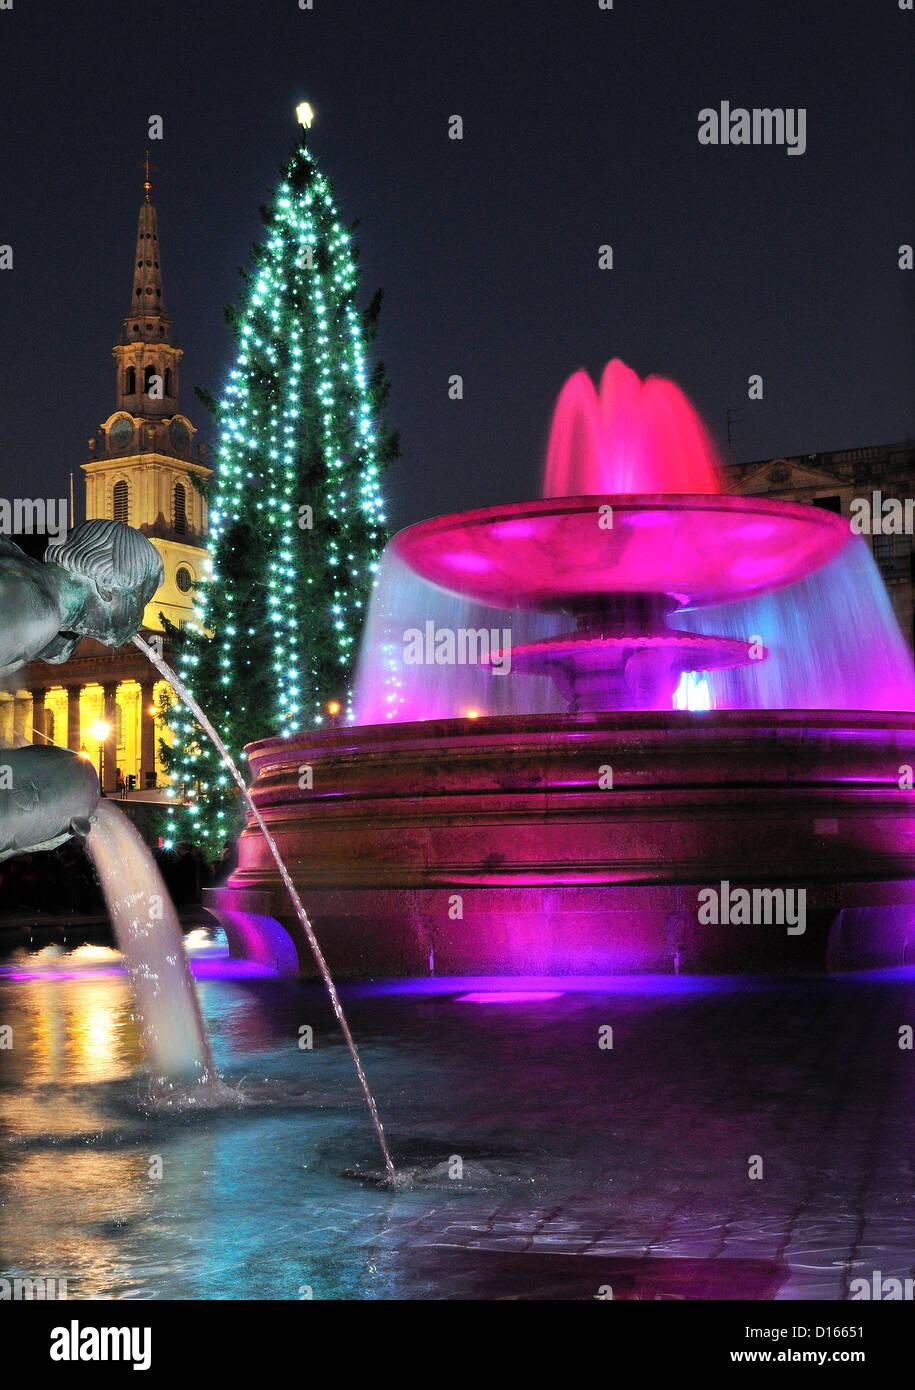 Trafalgar Square  London UK 8-12-2012 The Mayor of London saluted the gamesmakers, Team London ambassadors and travel - Stock Image